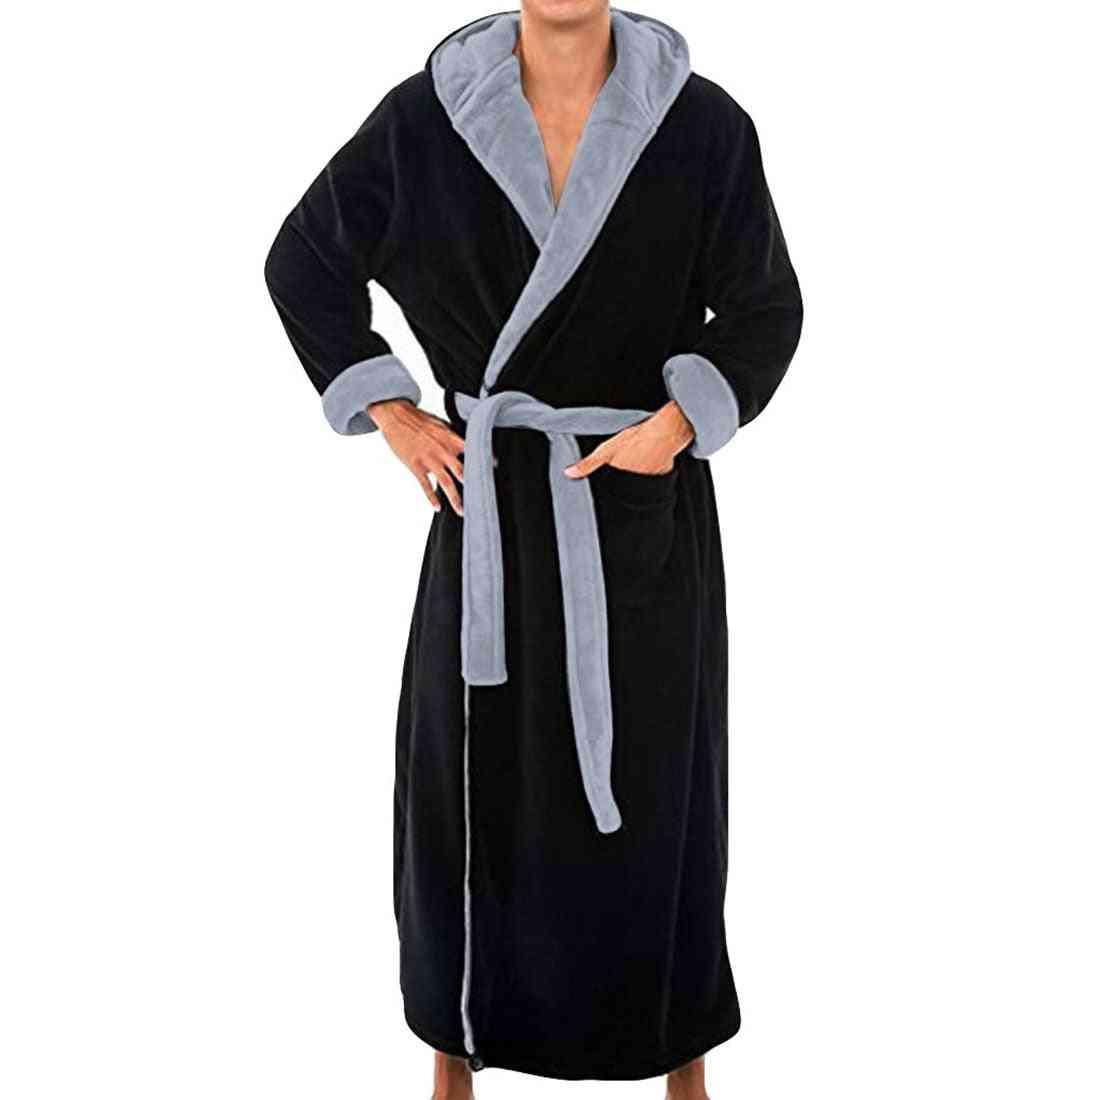 Autumn/ Winter- Thick Casual Hooded, Long Kimono Robe